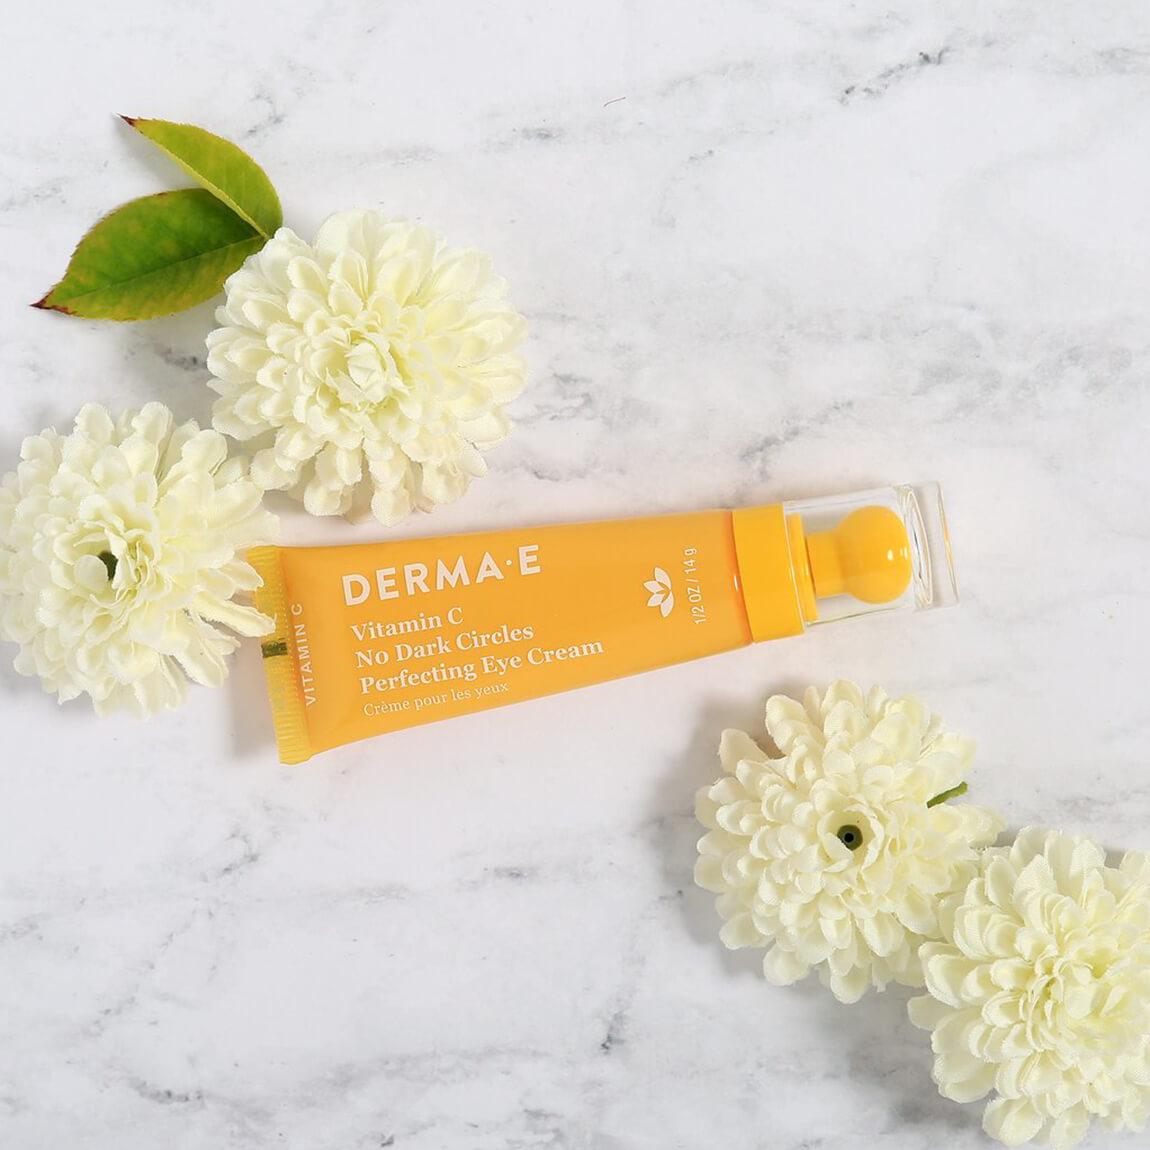 Derma E Vitamin C No Dark Circles Eye Cream 14ml | Beauty Hub